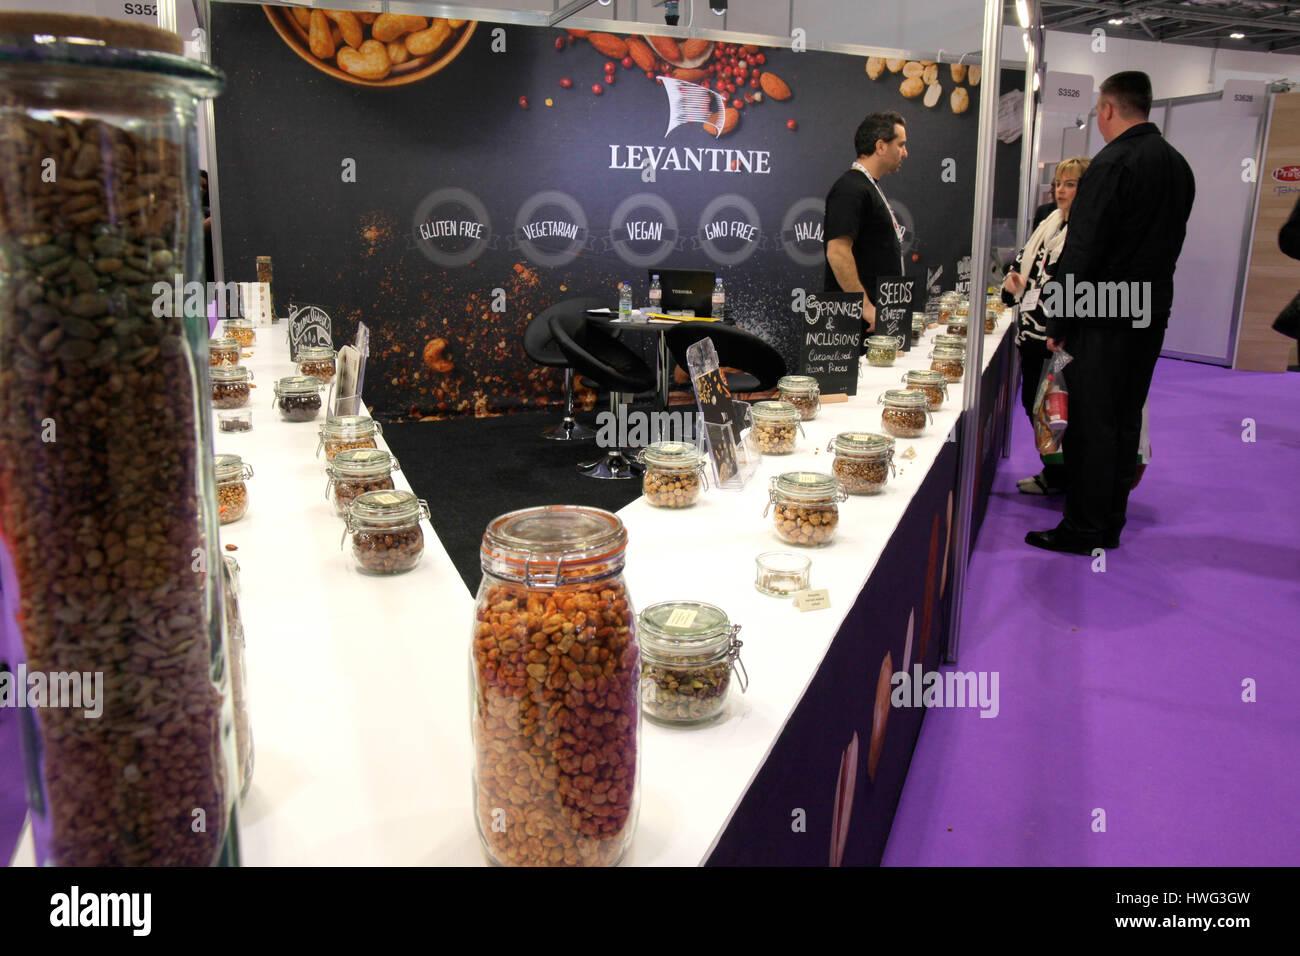 1 000 Food Food Stockfotos & 1 000 Food Food Bilder - Alamy